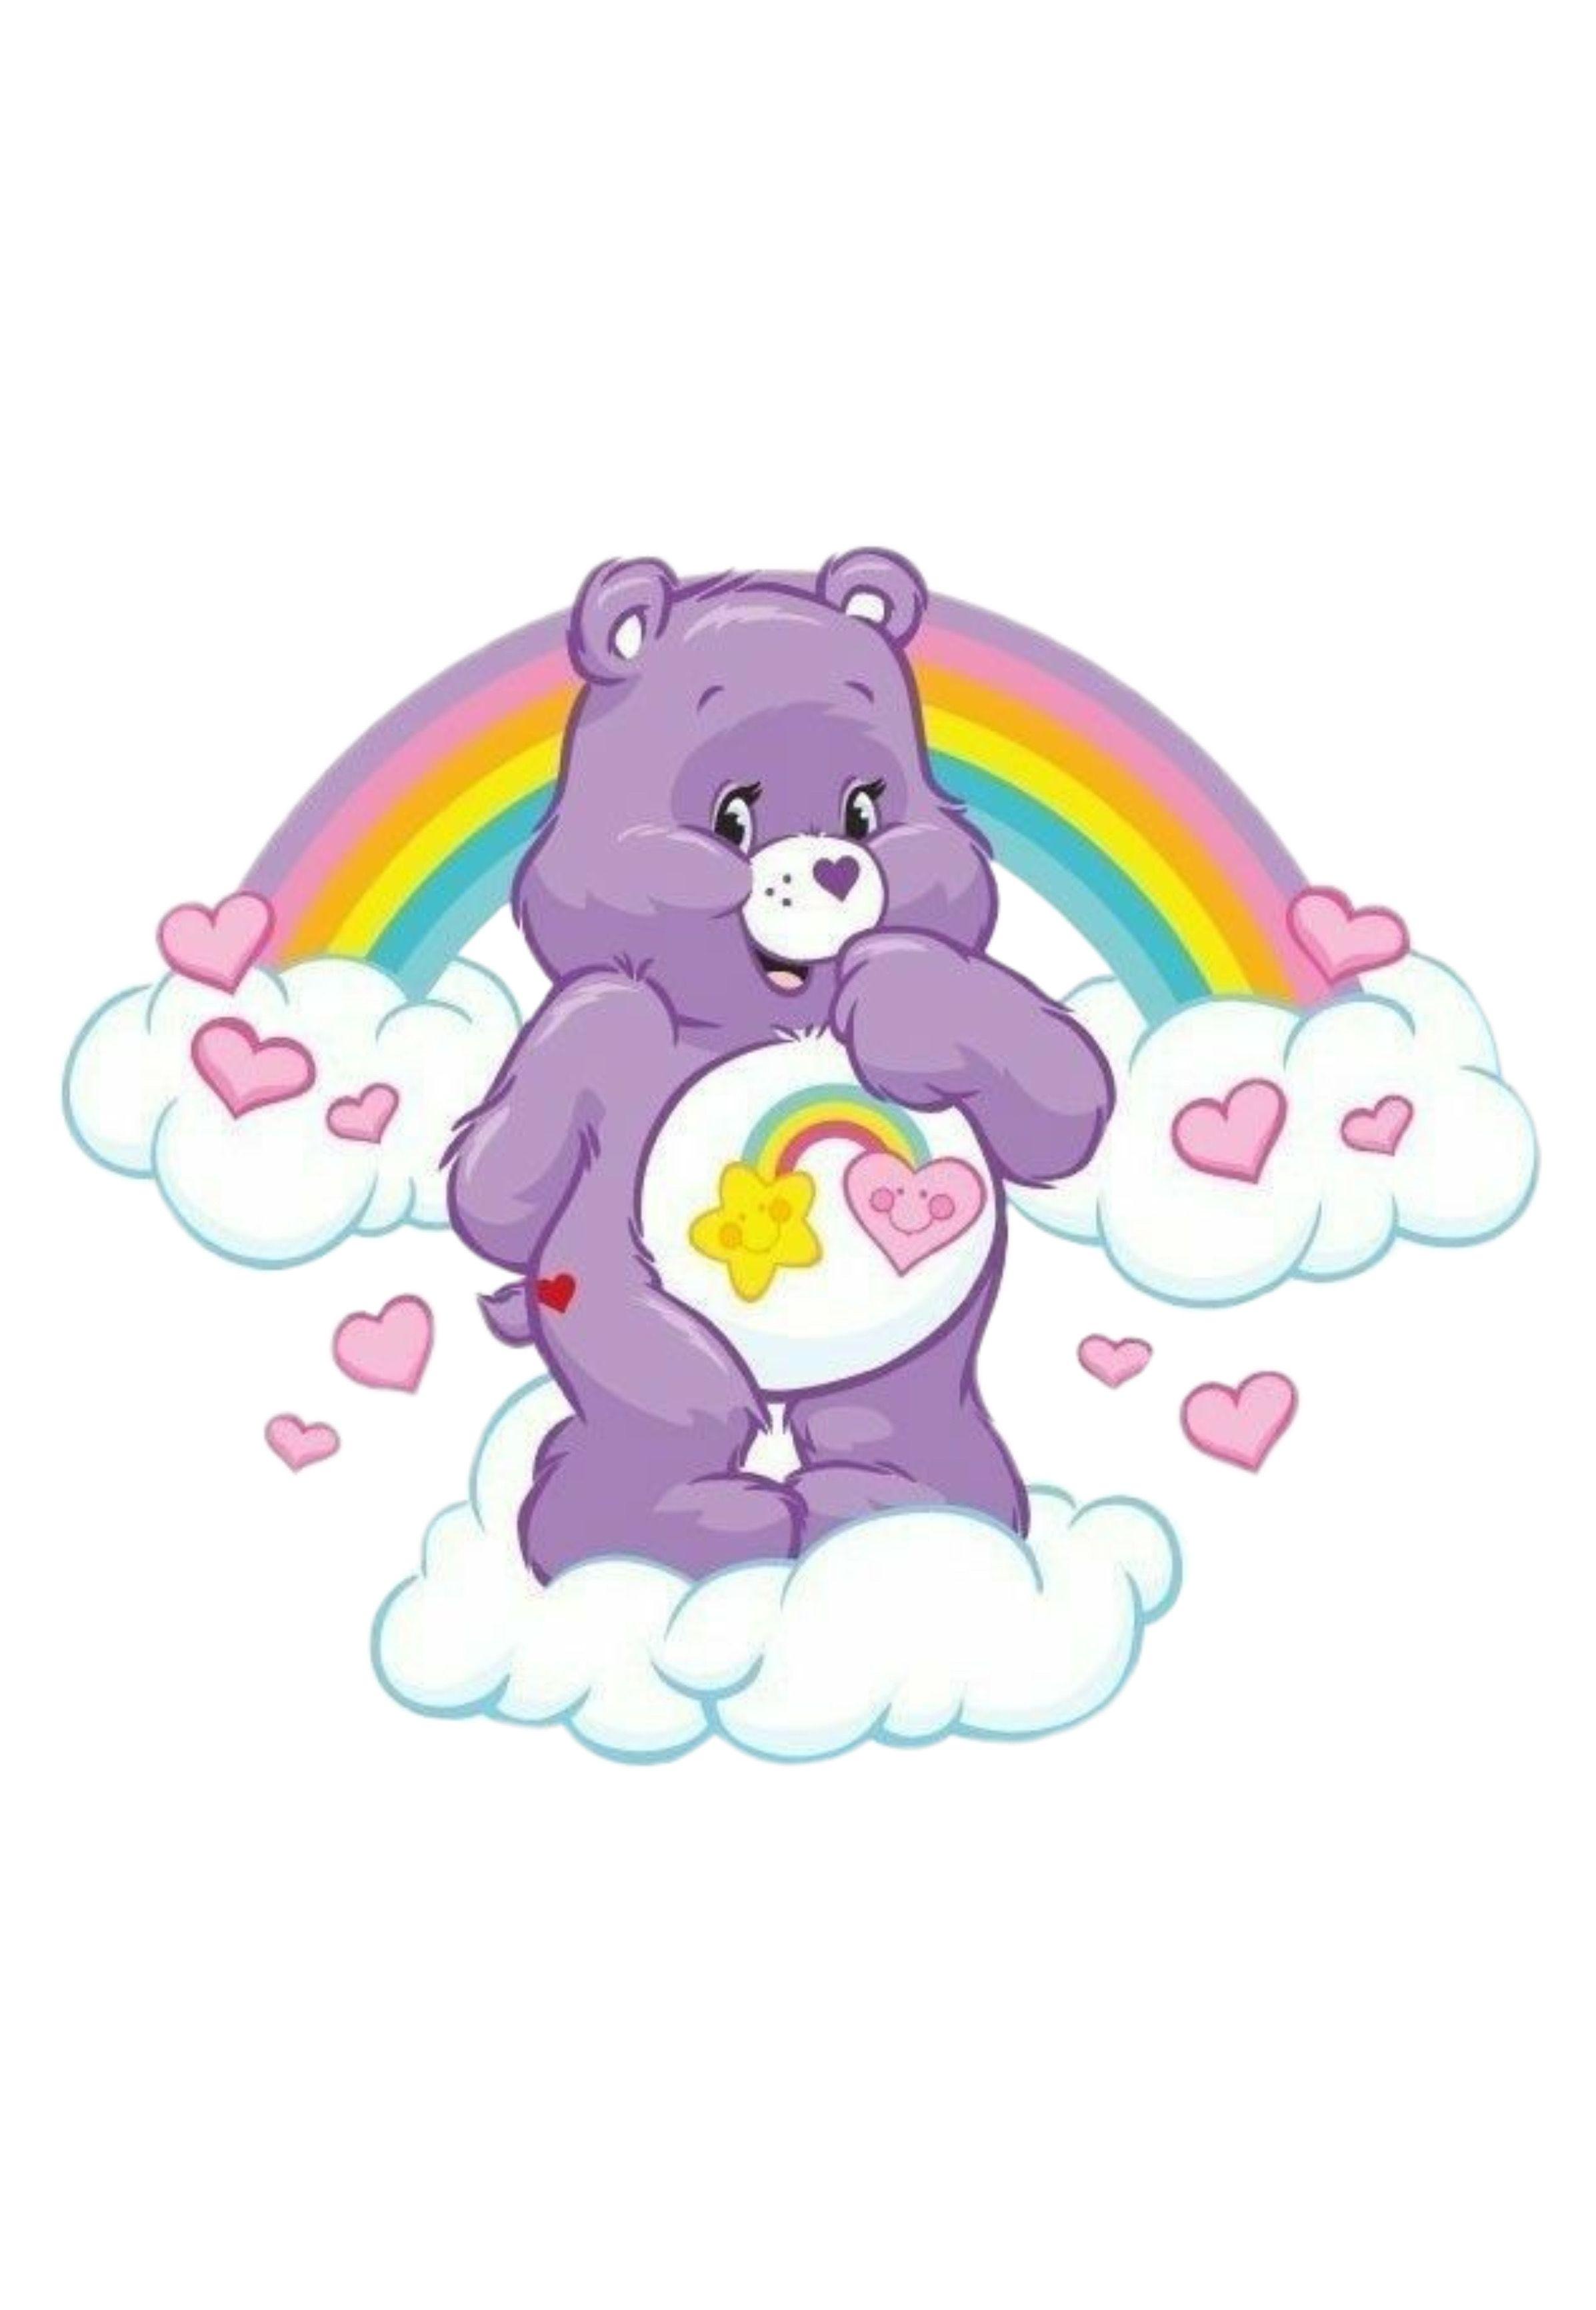 Pin von Yajaira Bastidas auf Care Bears   Glücksbärchi party ...